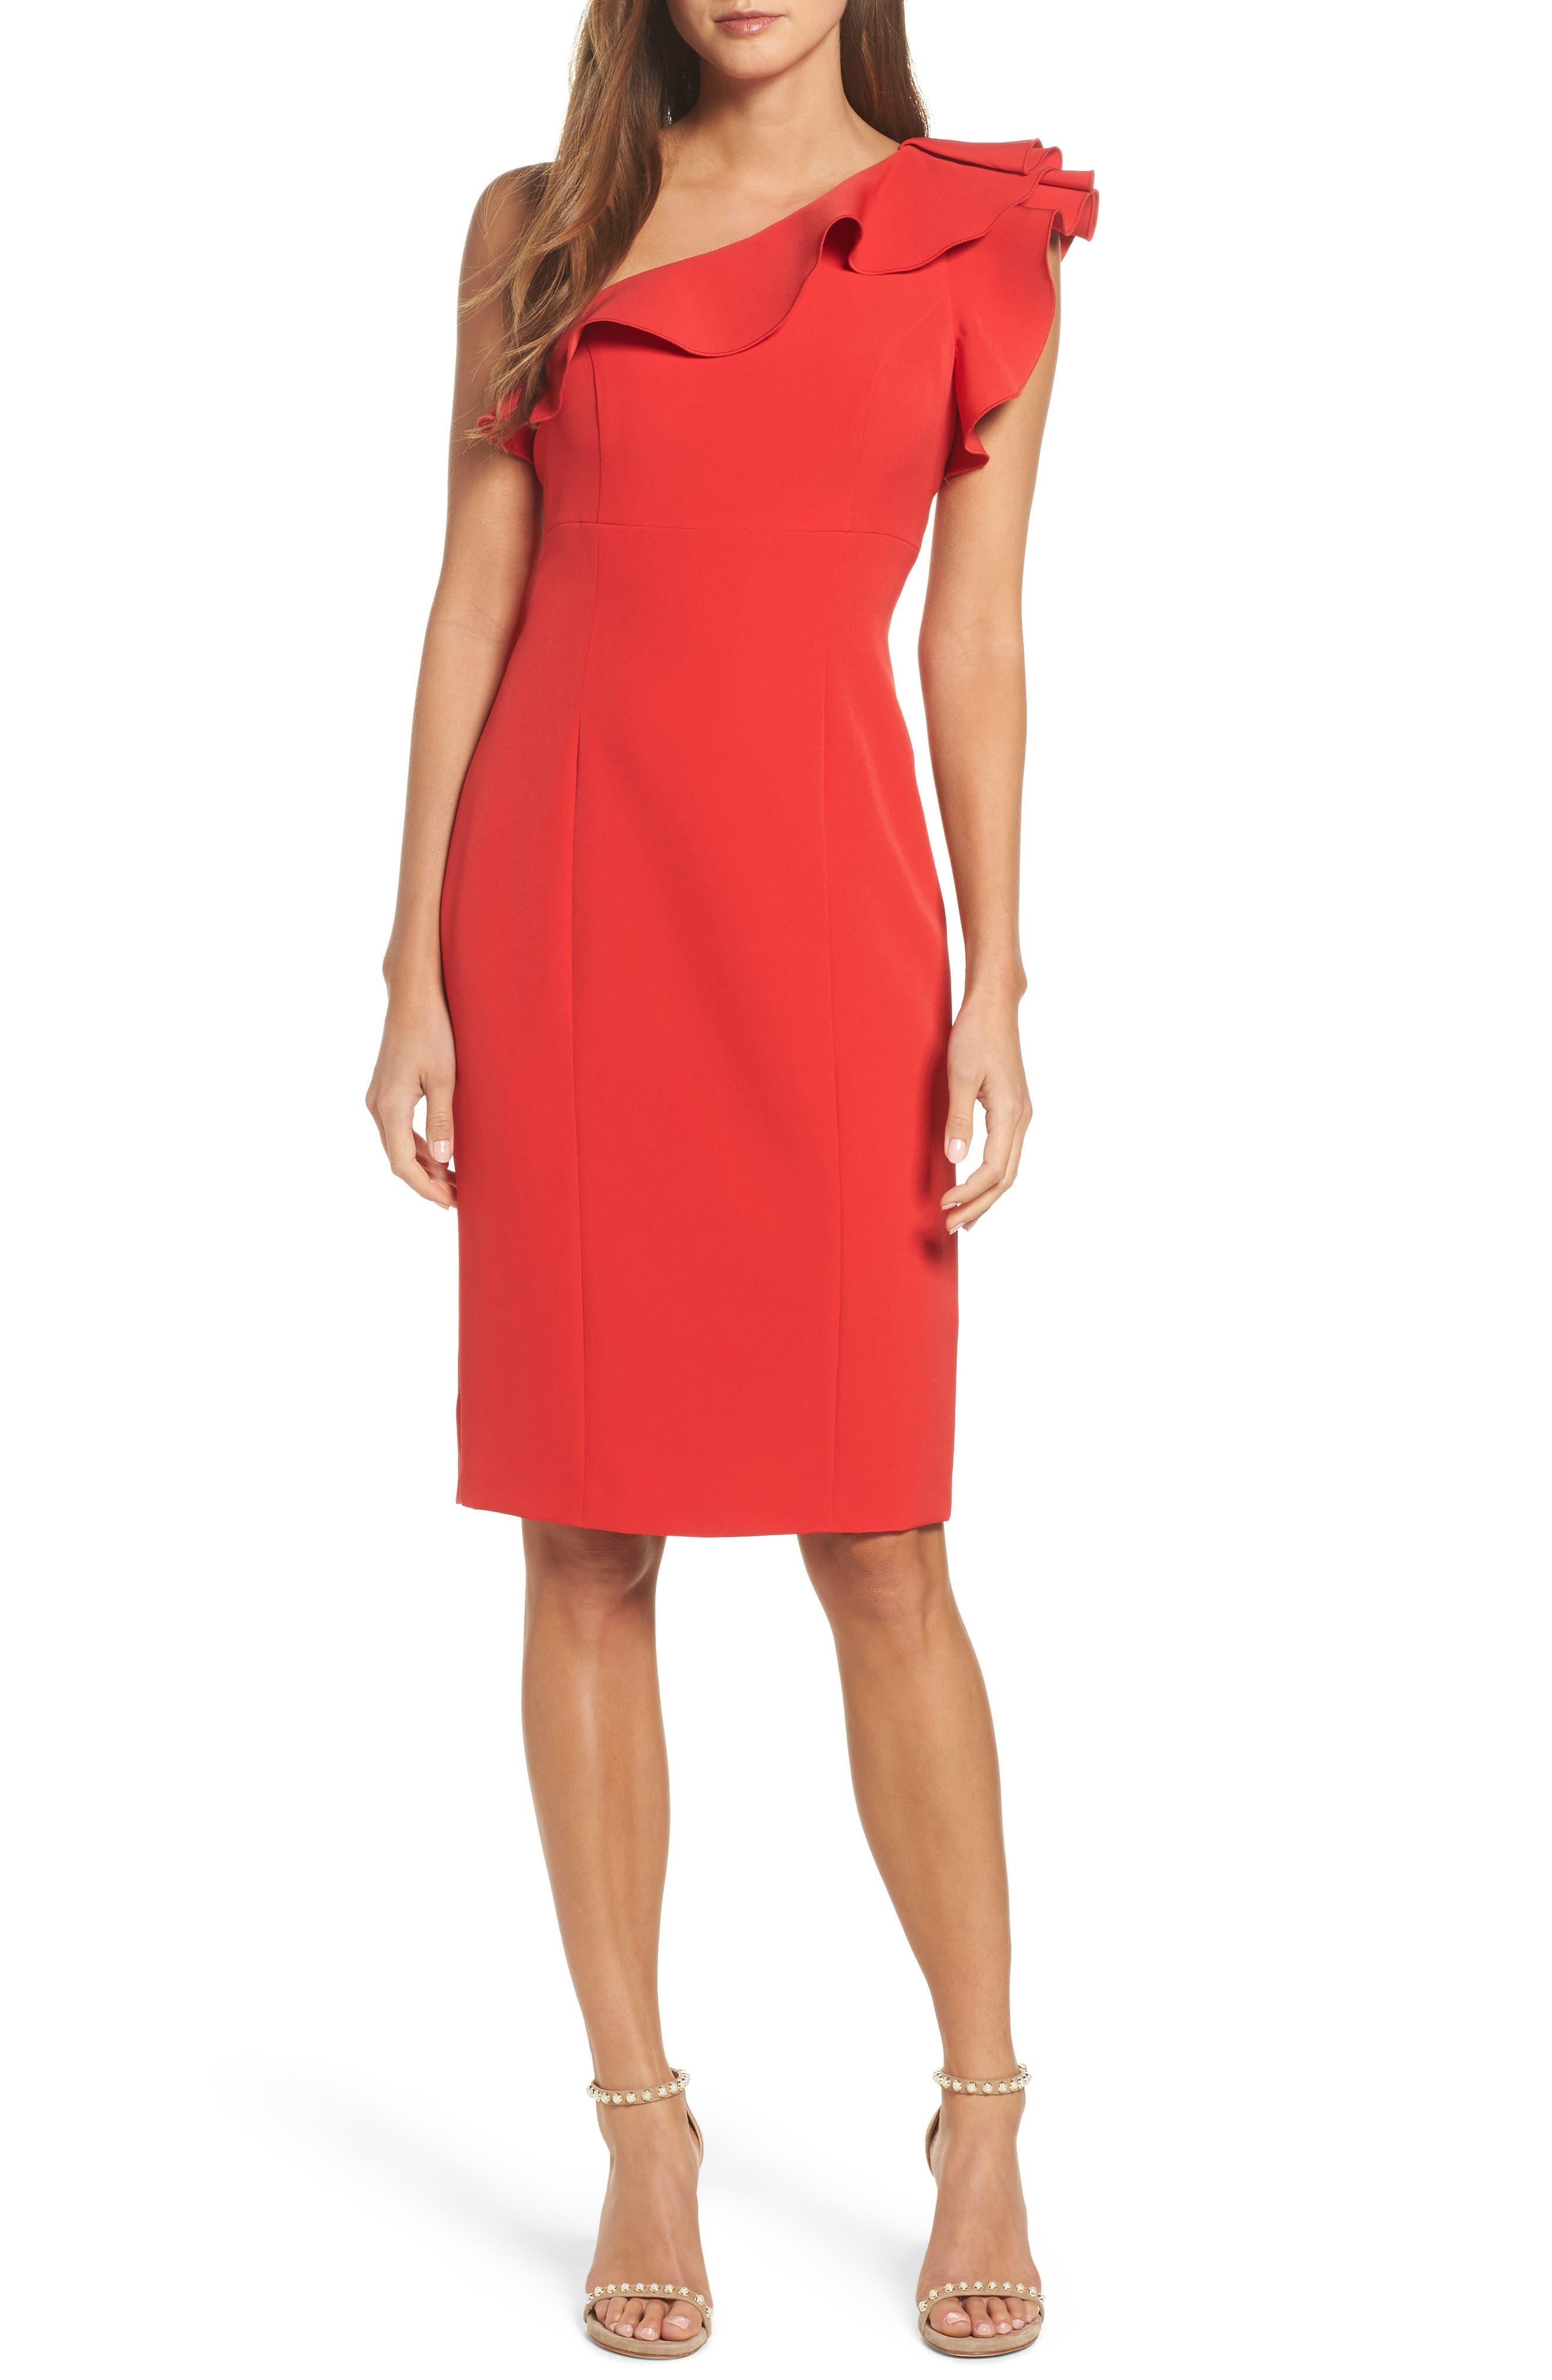 Alternate Image 1 Selected - Eliza J Ruffle One-Shoulder Dress